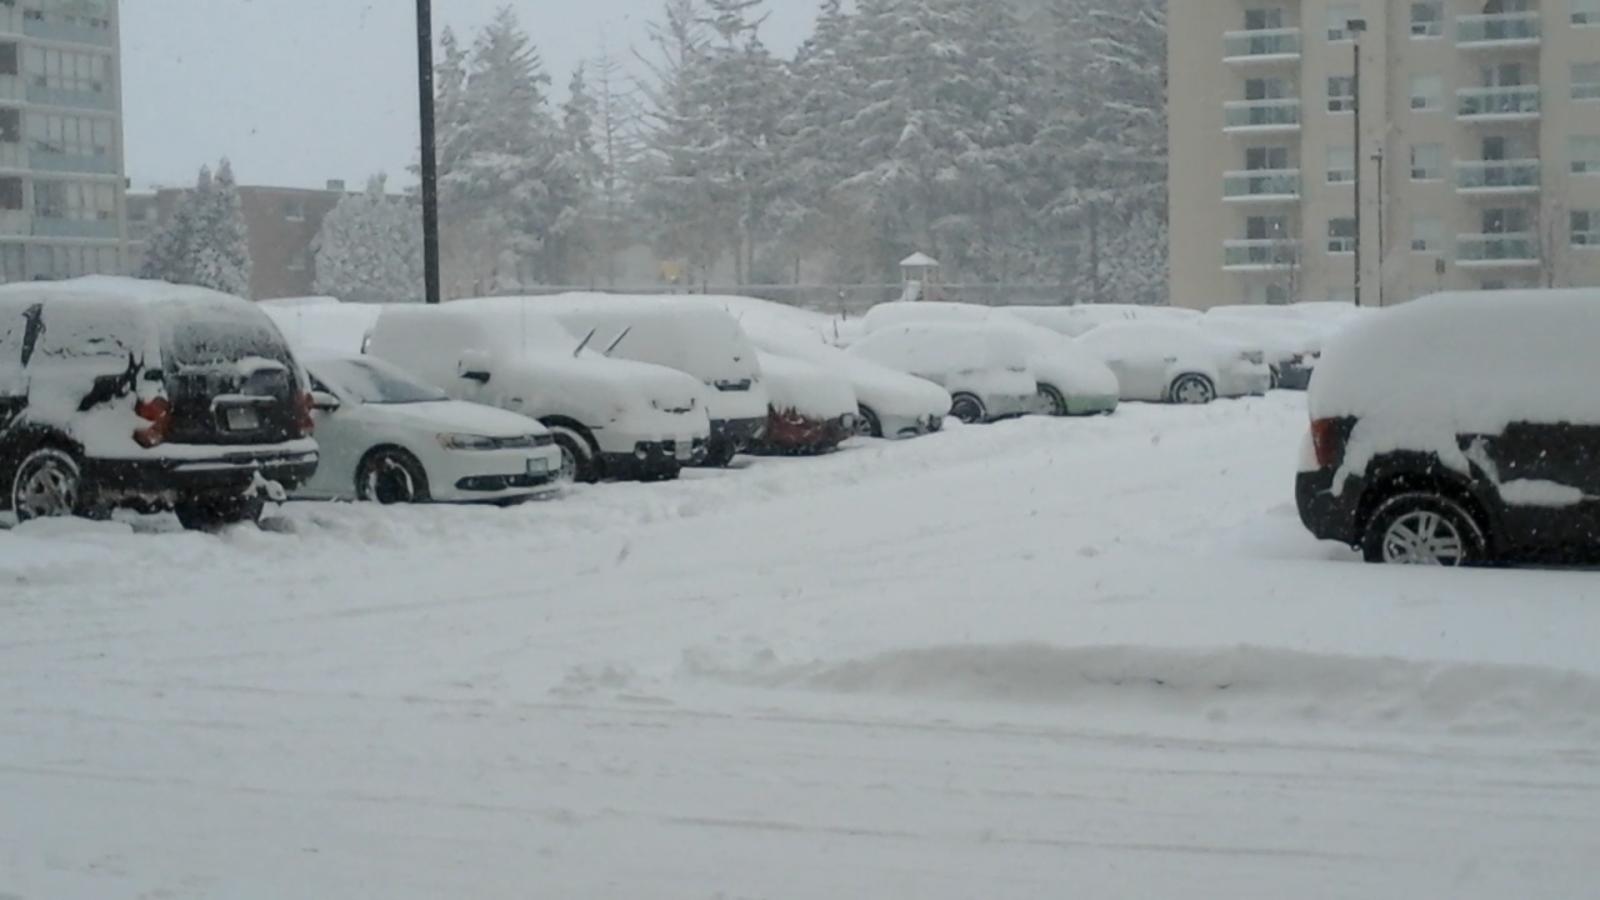 Heavy snowfall hammers Southwestern Ontario